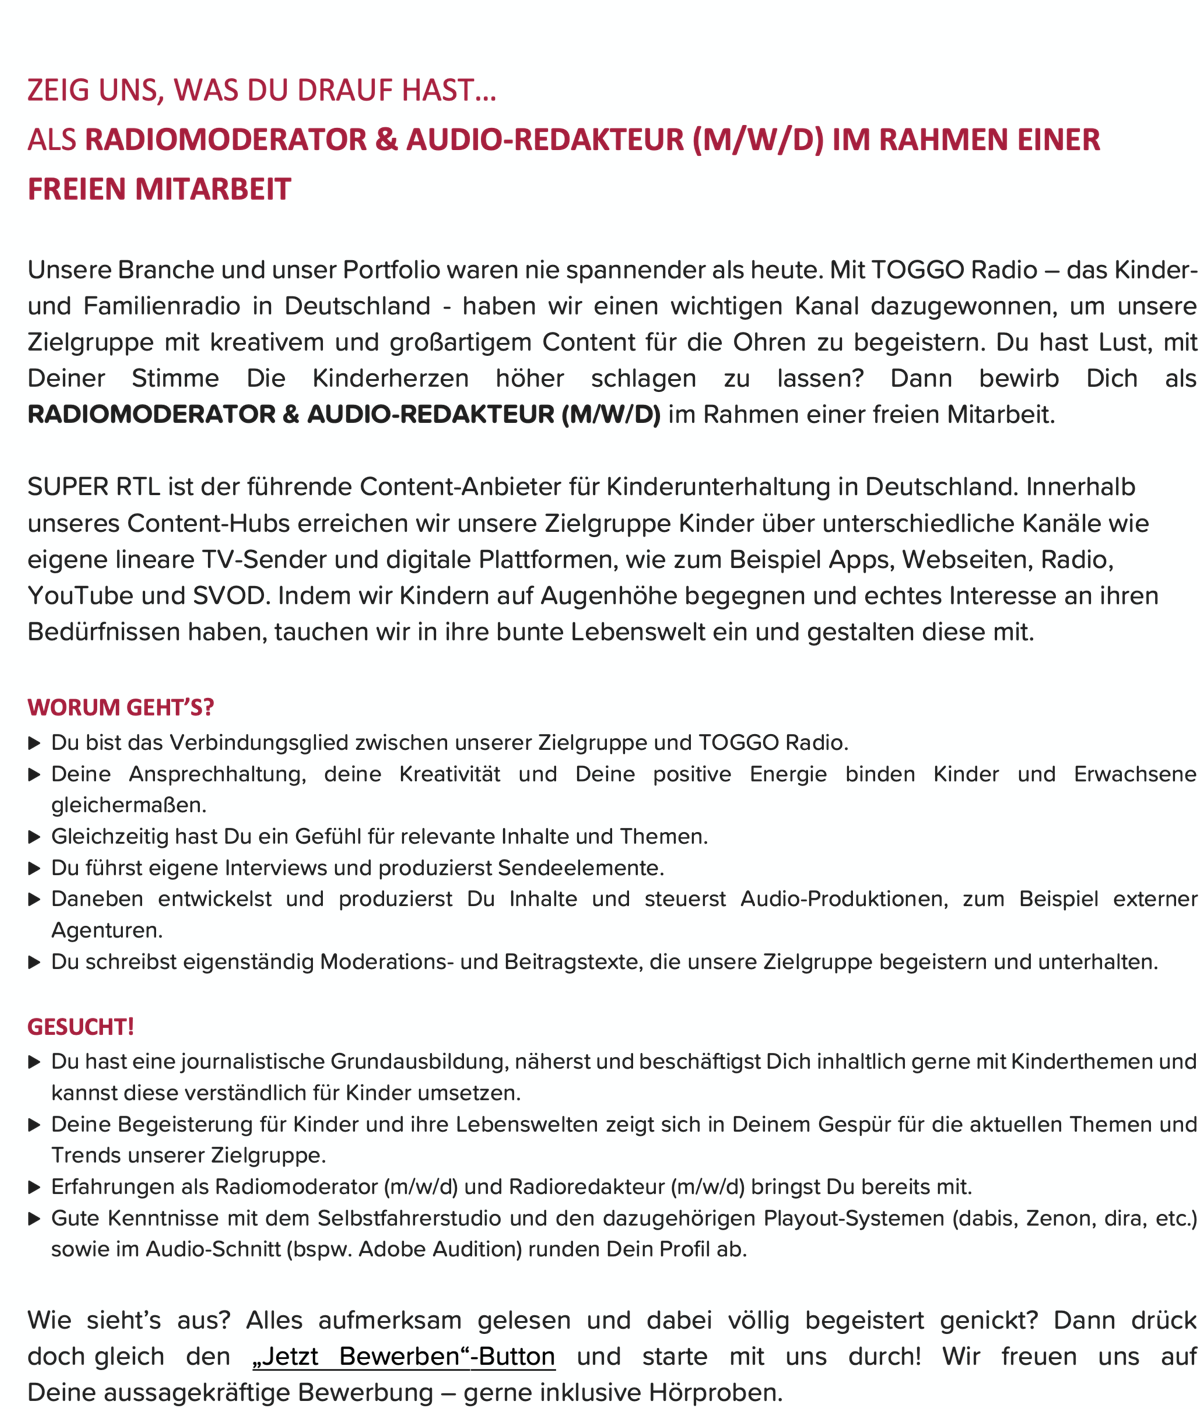 TOGGO Radio sucht Radiomoderator & Audio-Redakteur (m/w/d)